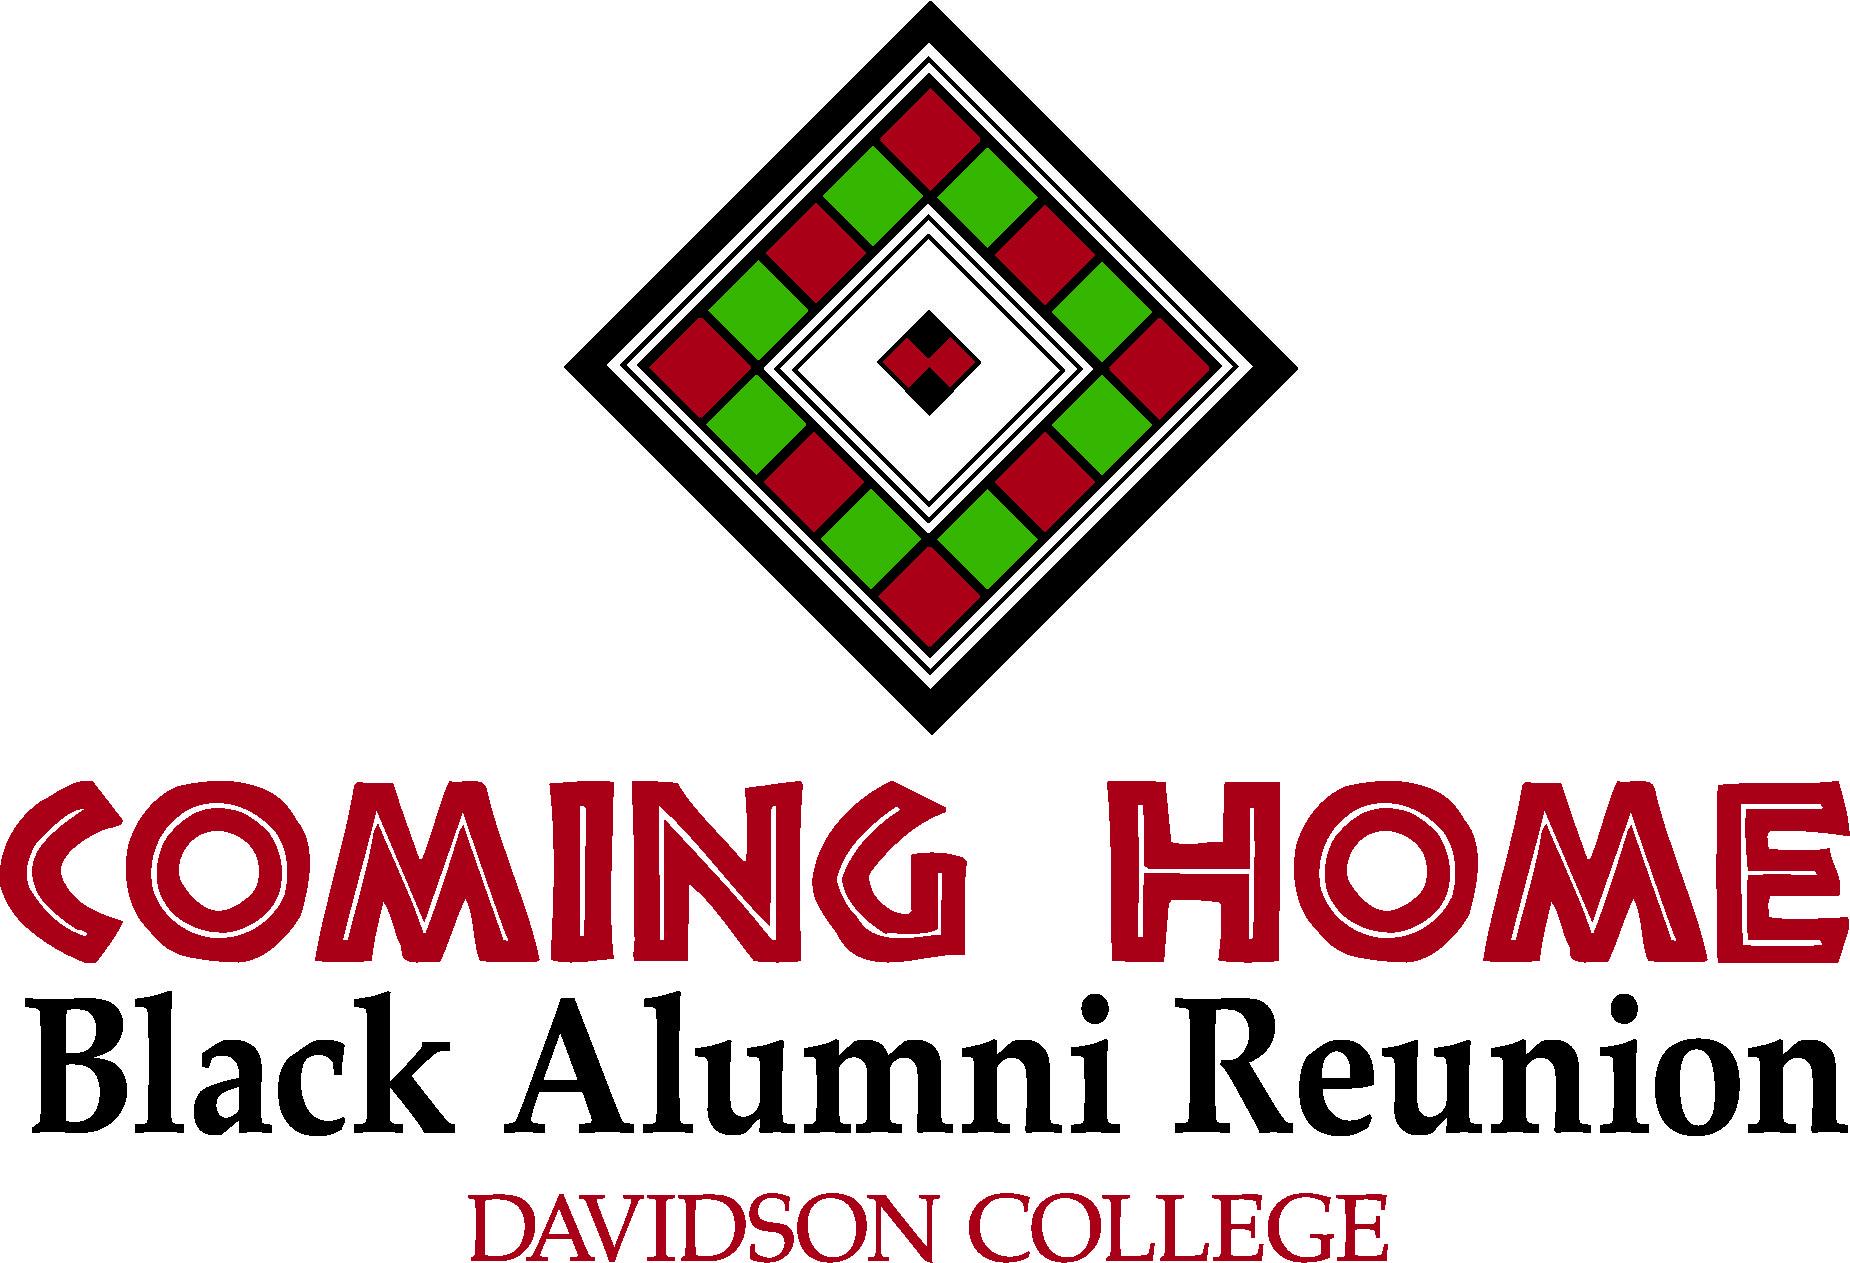 Black Alumni Reunion Logo Image